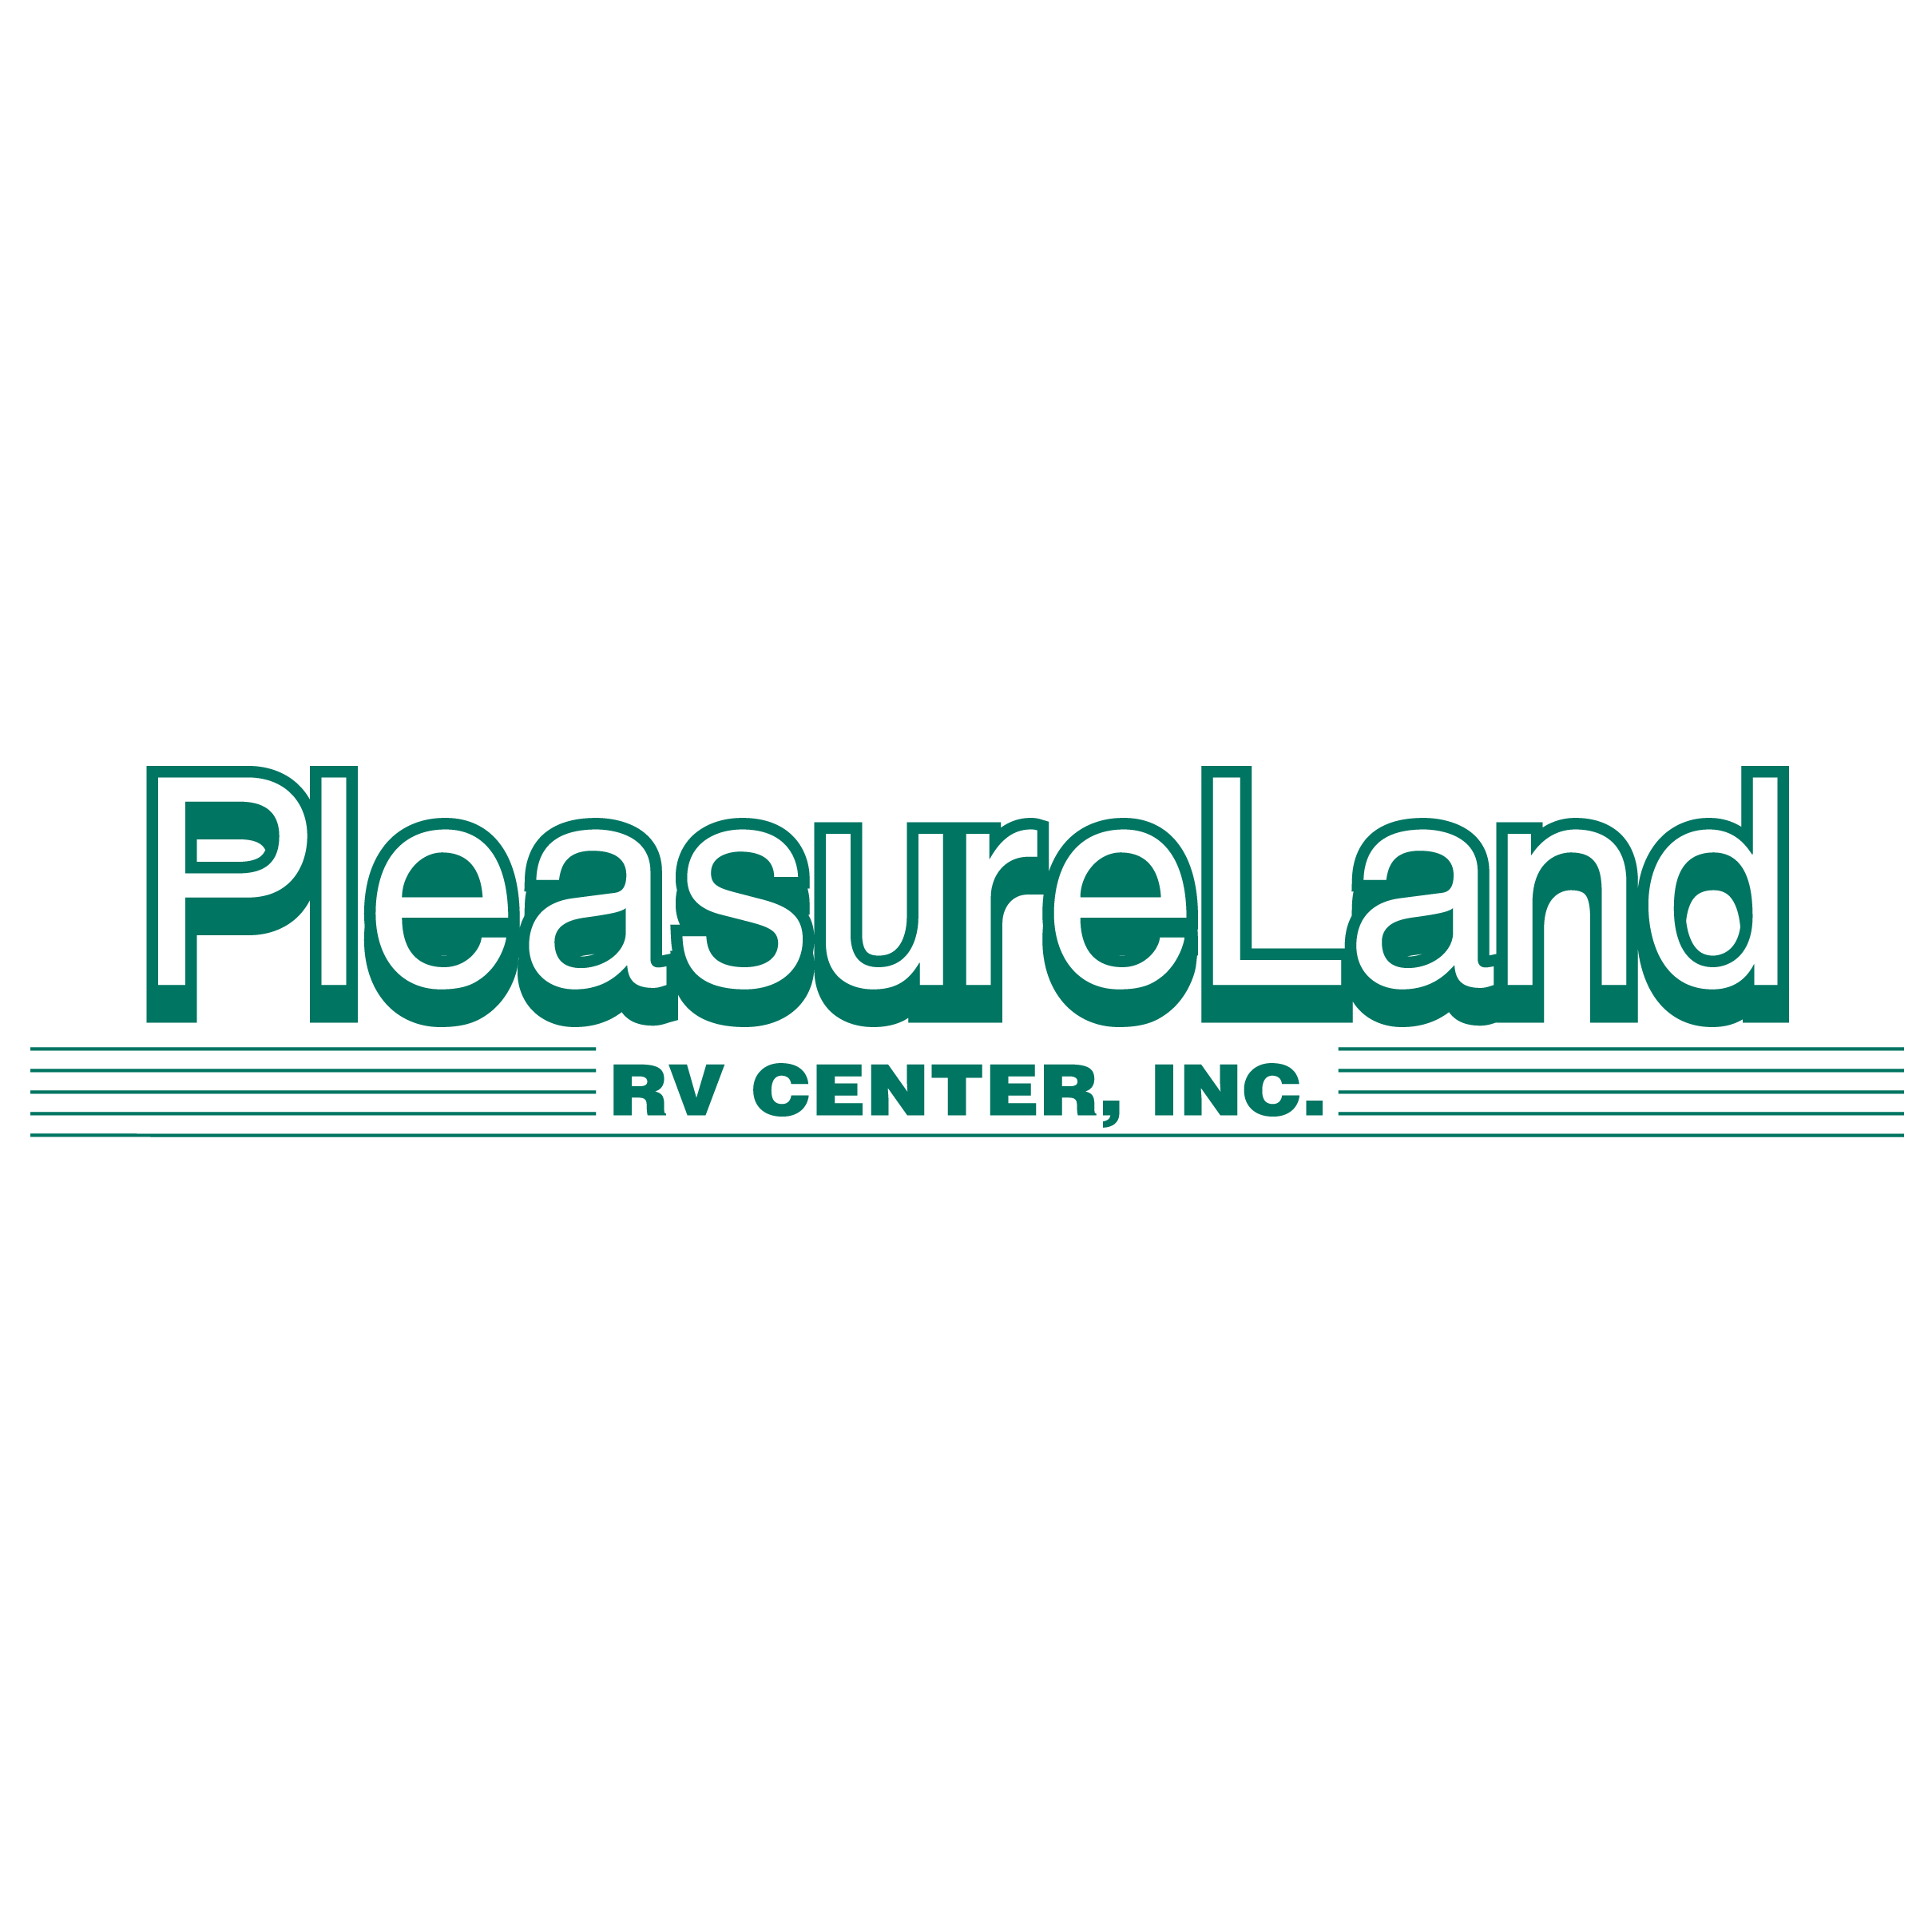 Pleasureland RV Center - St Cloud